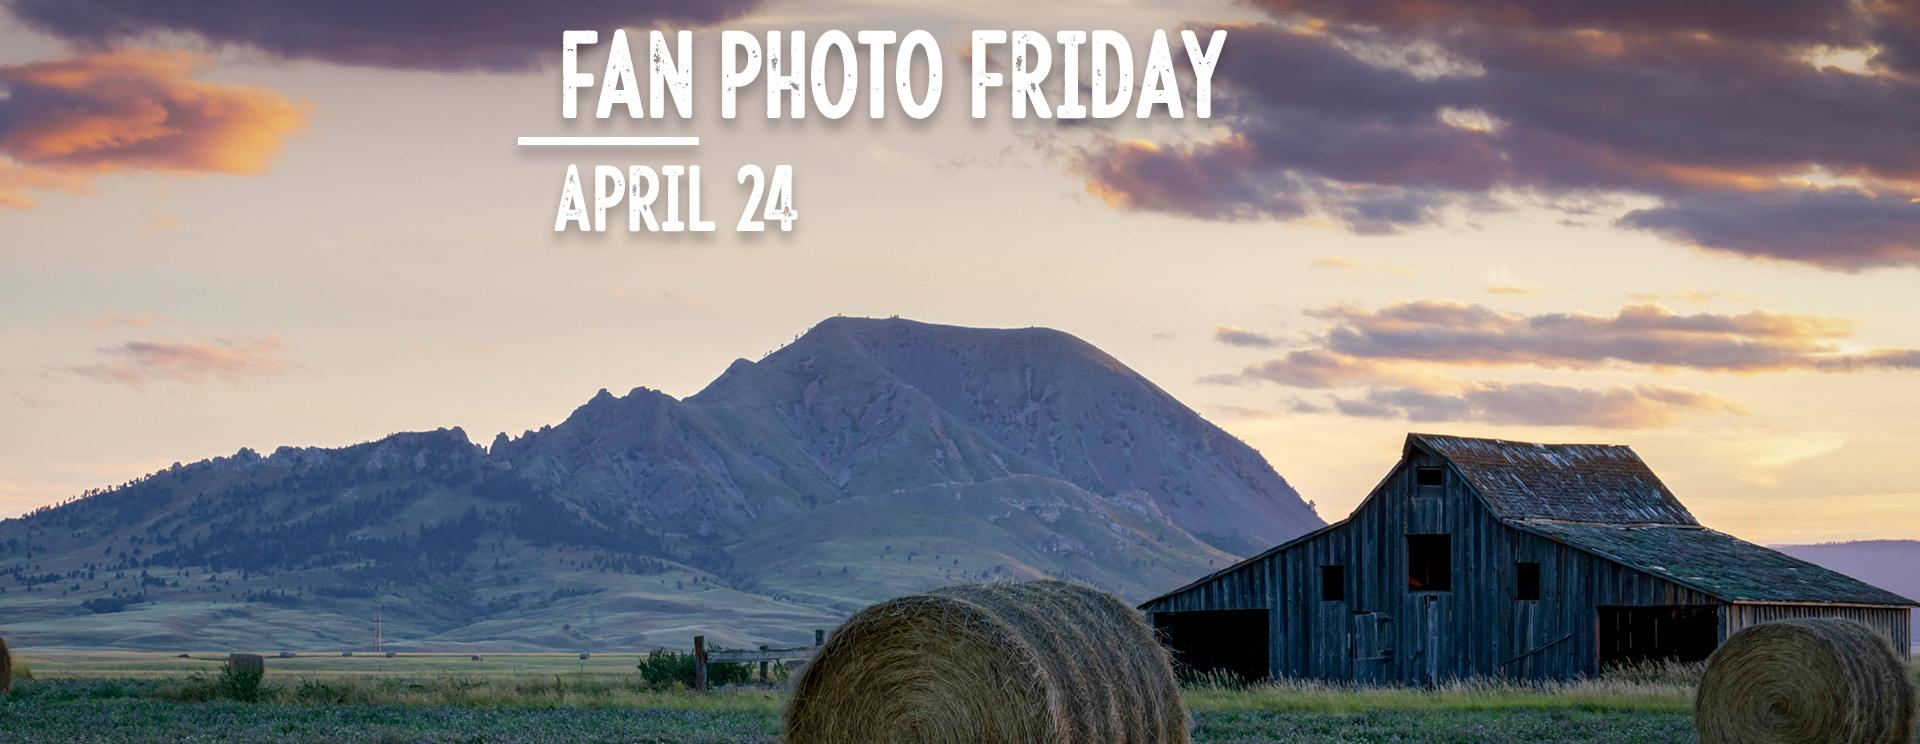 Fan Photo Friday | April 24, 2020